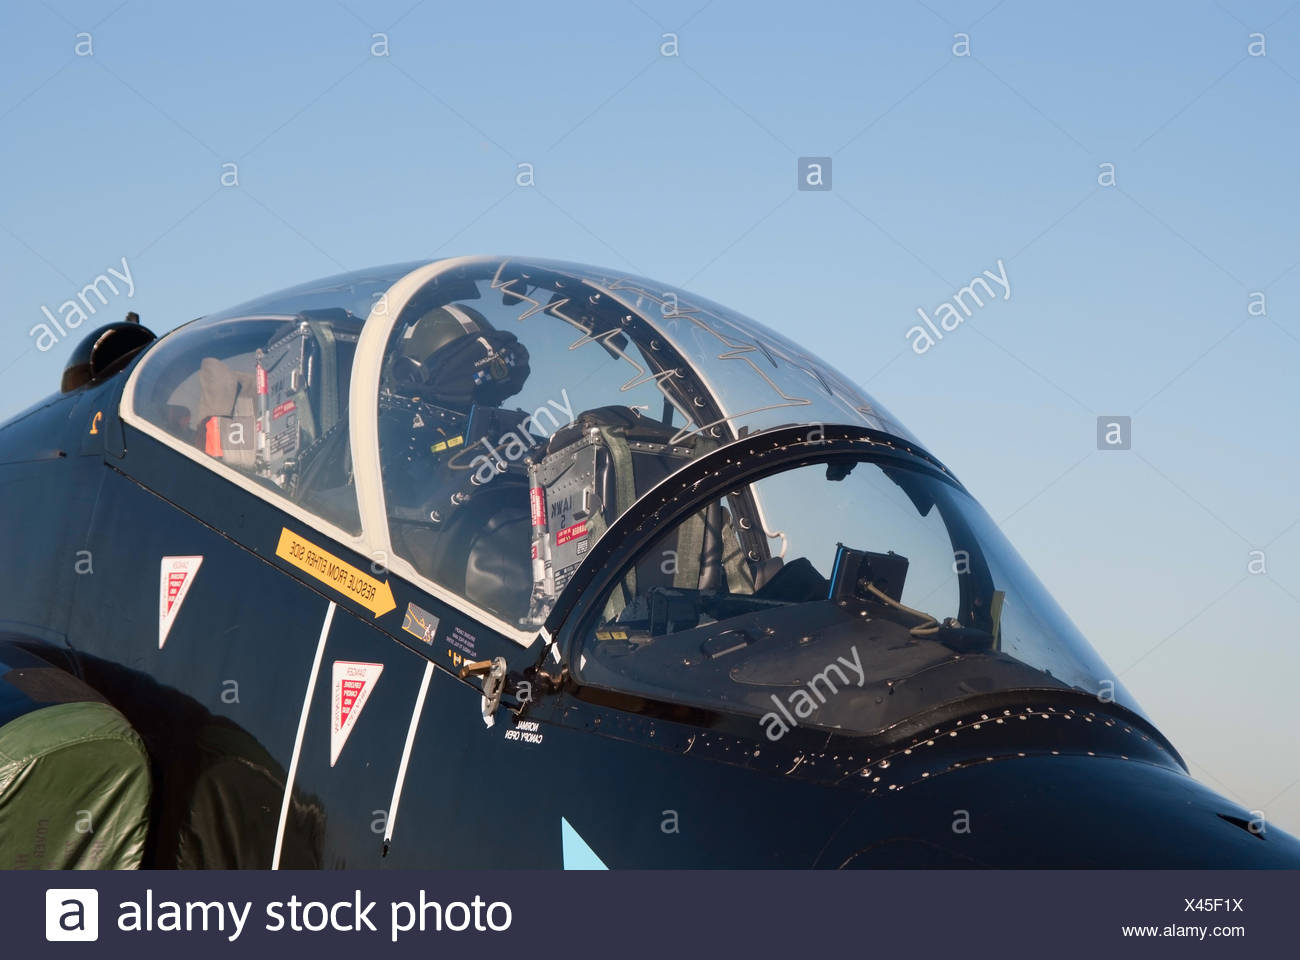 Closeup of the cockpit of BAe Hawk jet - Stock Image